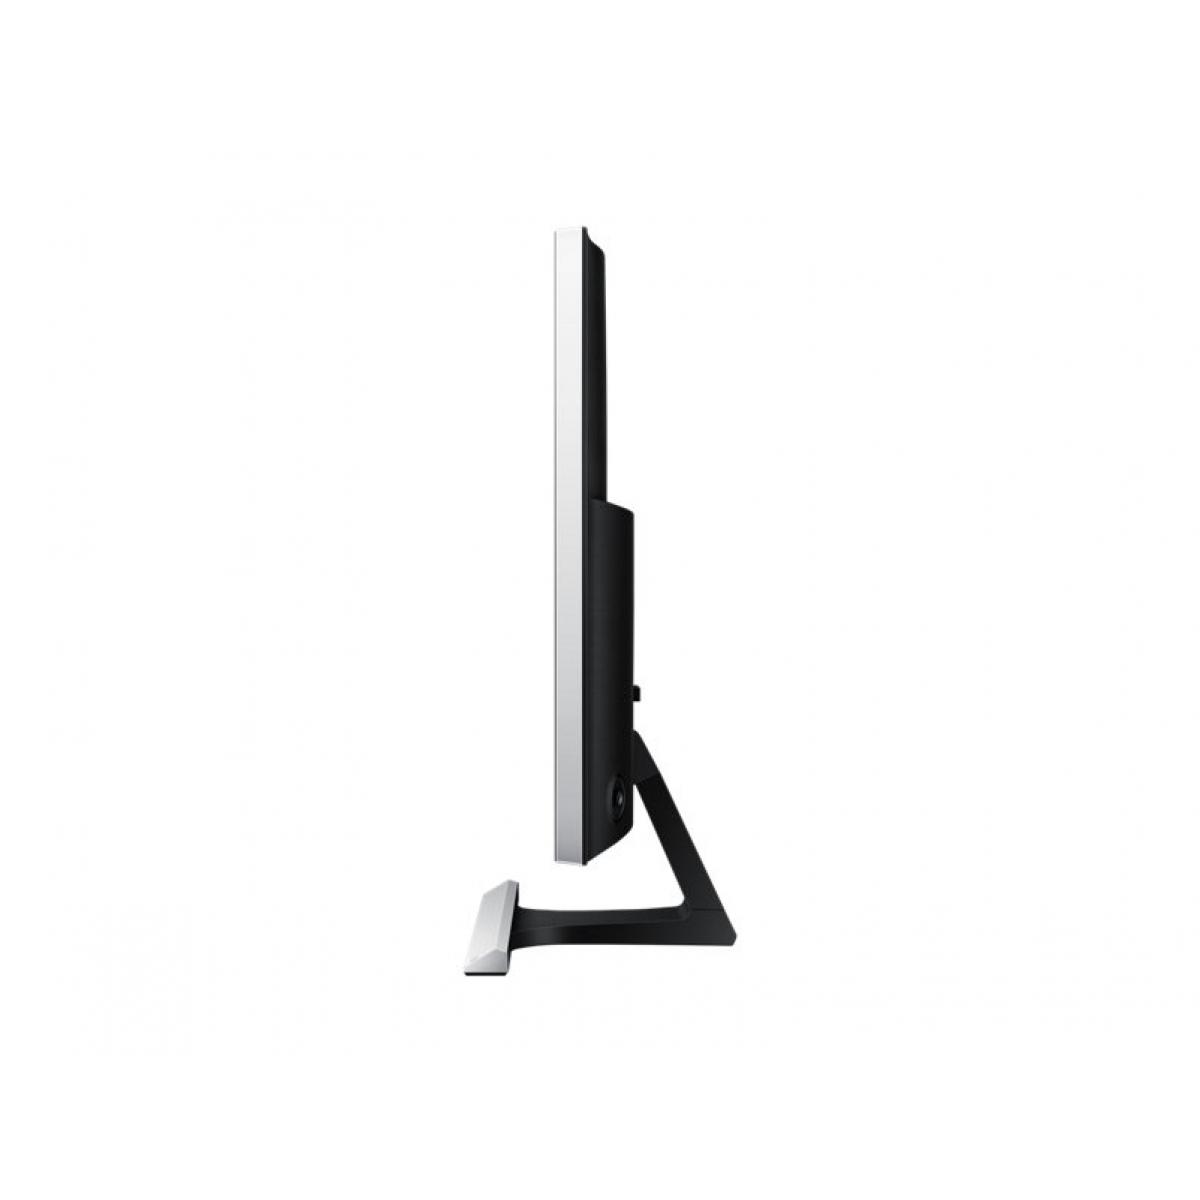 Monitor Gamer Samsung 28 Pol, Ultra HD 4k, 1ms, AMD FreeSync, LU28E590DS/ZD